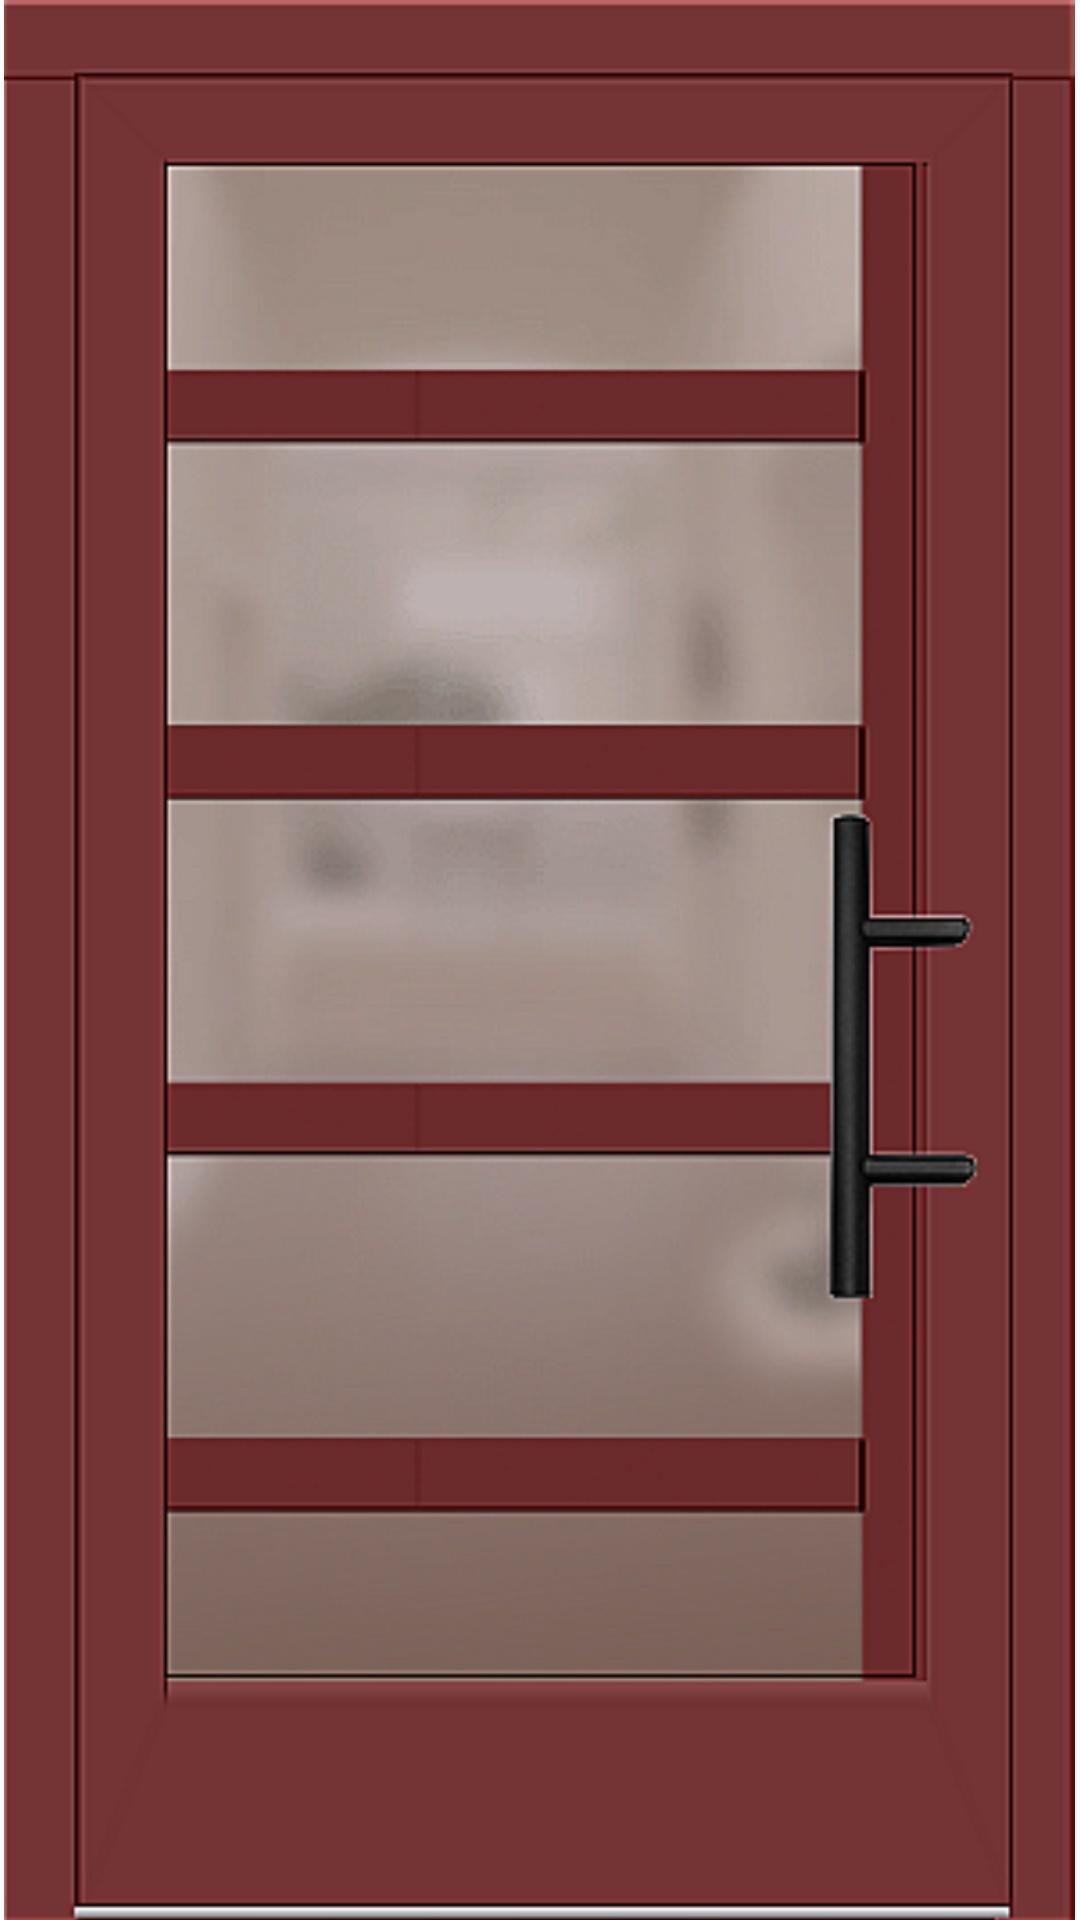 Holz Haustür Modell 5740 rubinrot